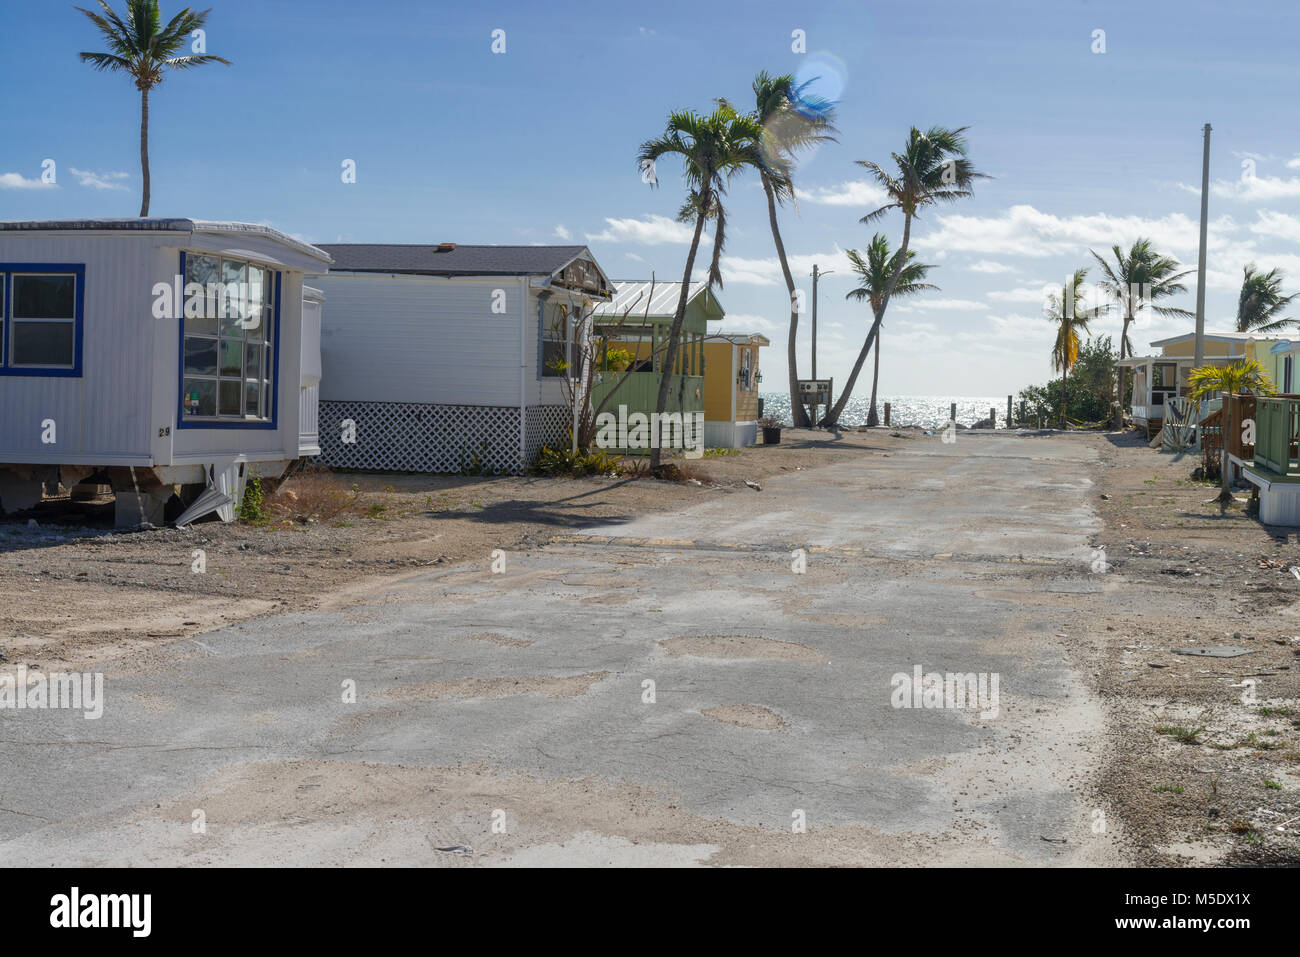 Hurricane Irma Sturm Schäden an verlassenen Trailer Park, Islamorada, Florida, USA Stockbild